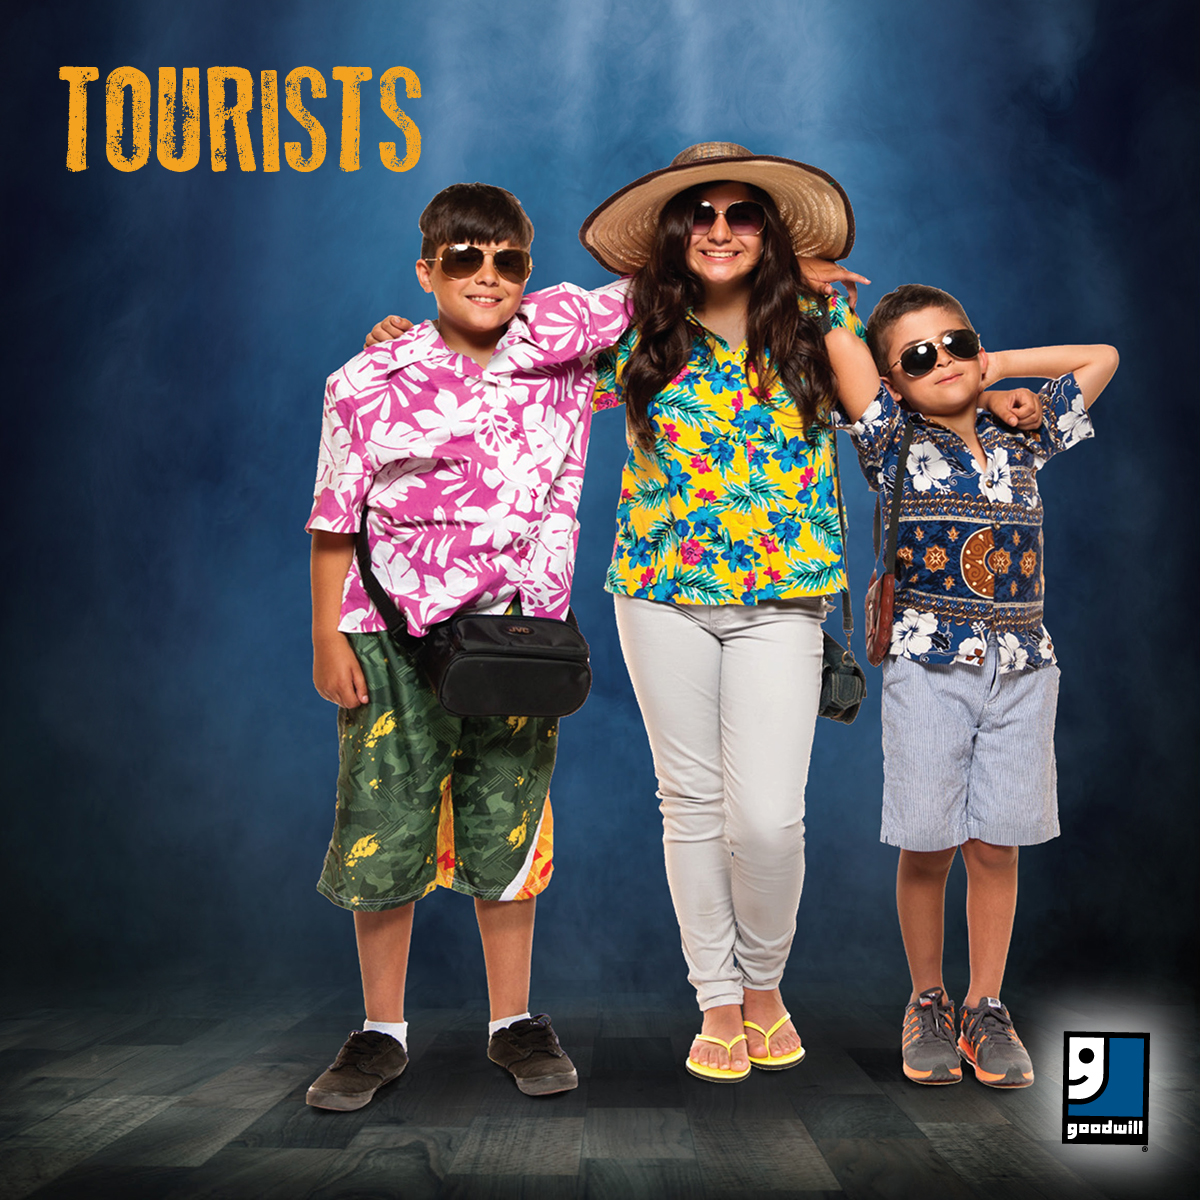 tourists-sq.jpg